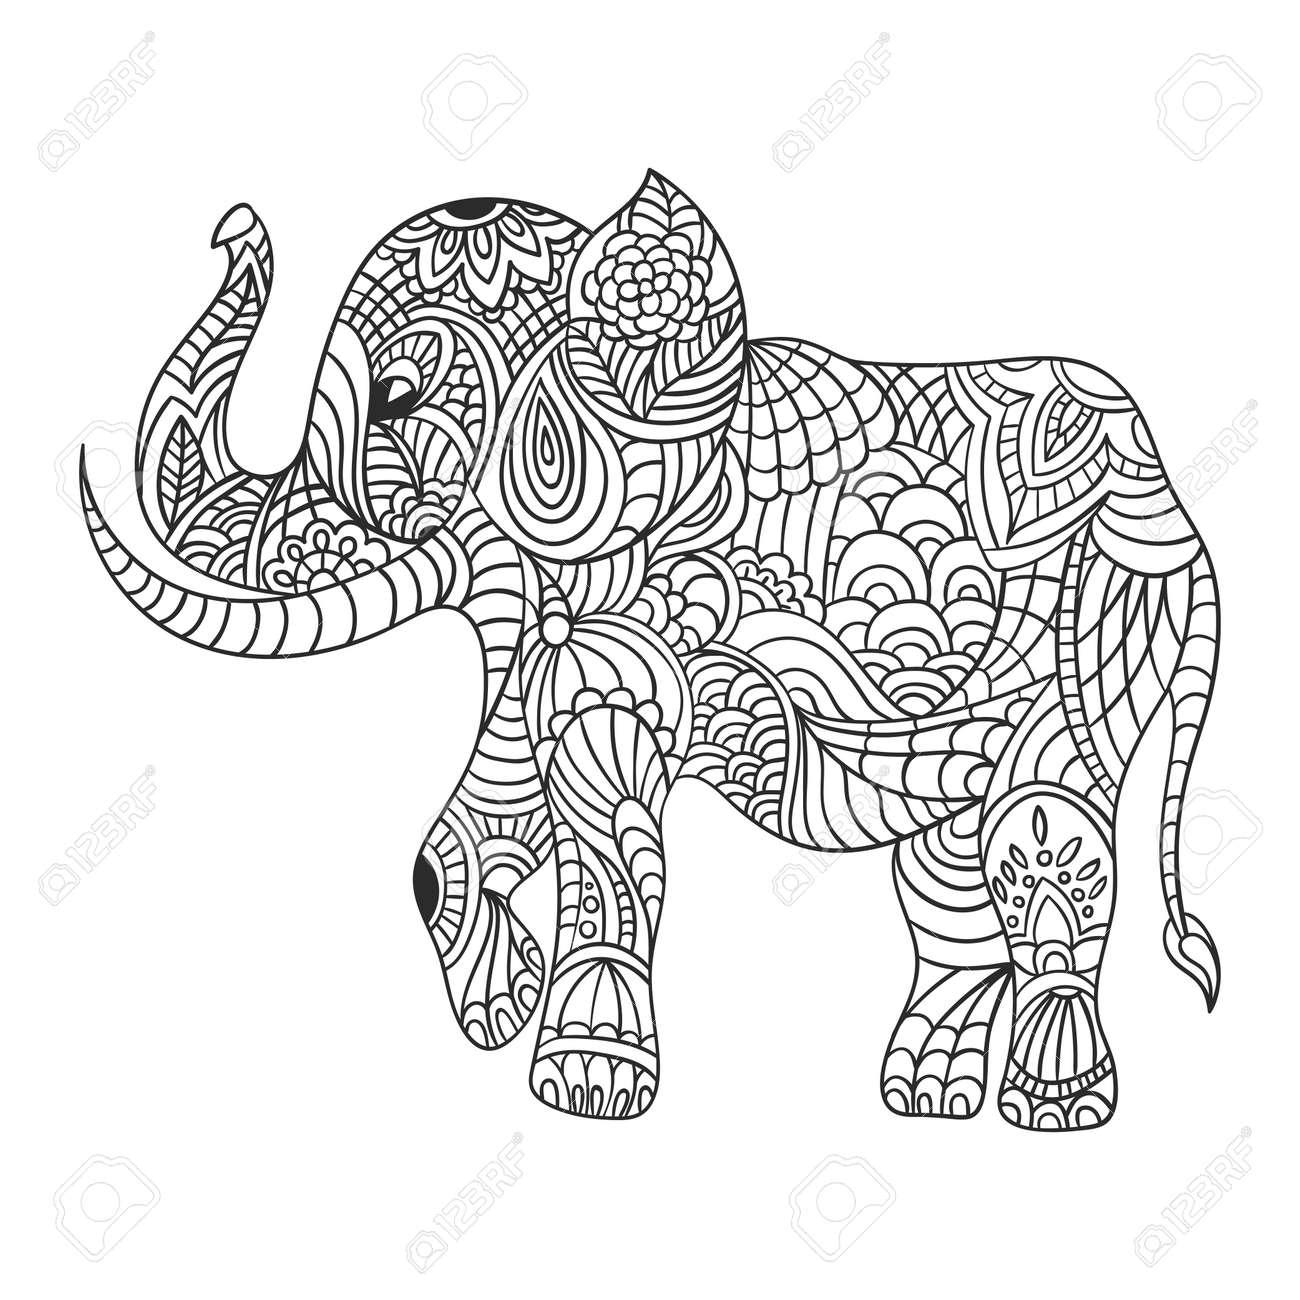 Vector Monochrome Hand Drawn Zentagle Illustration Of An Elephant ...